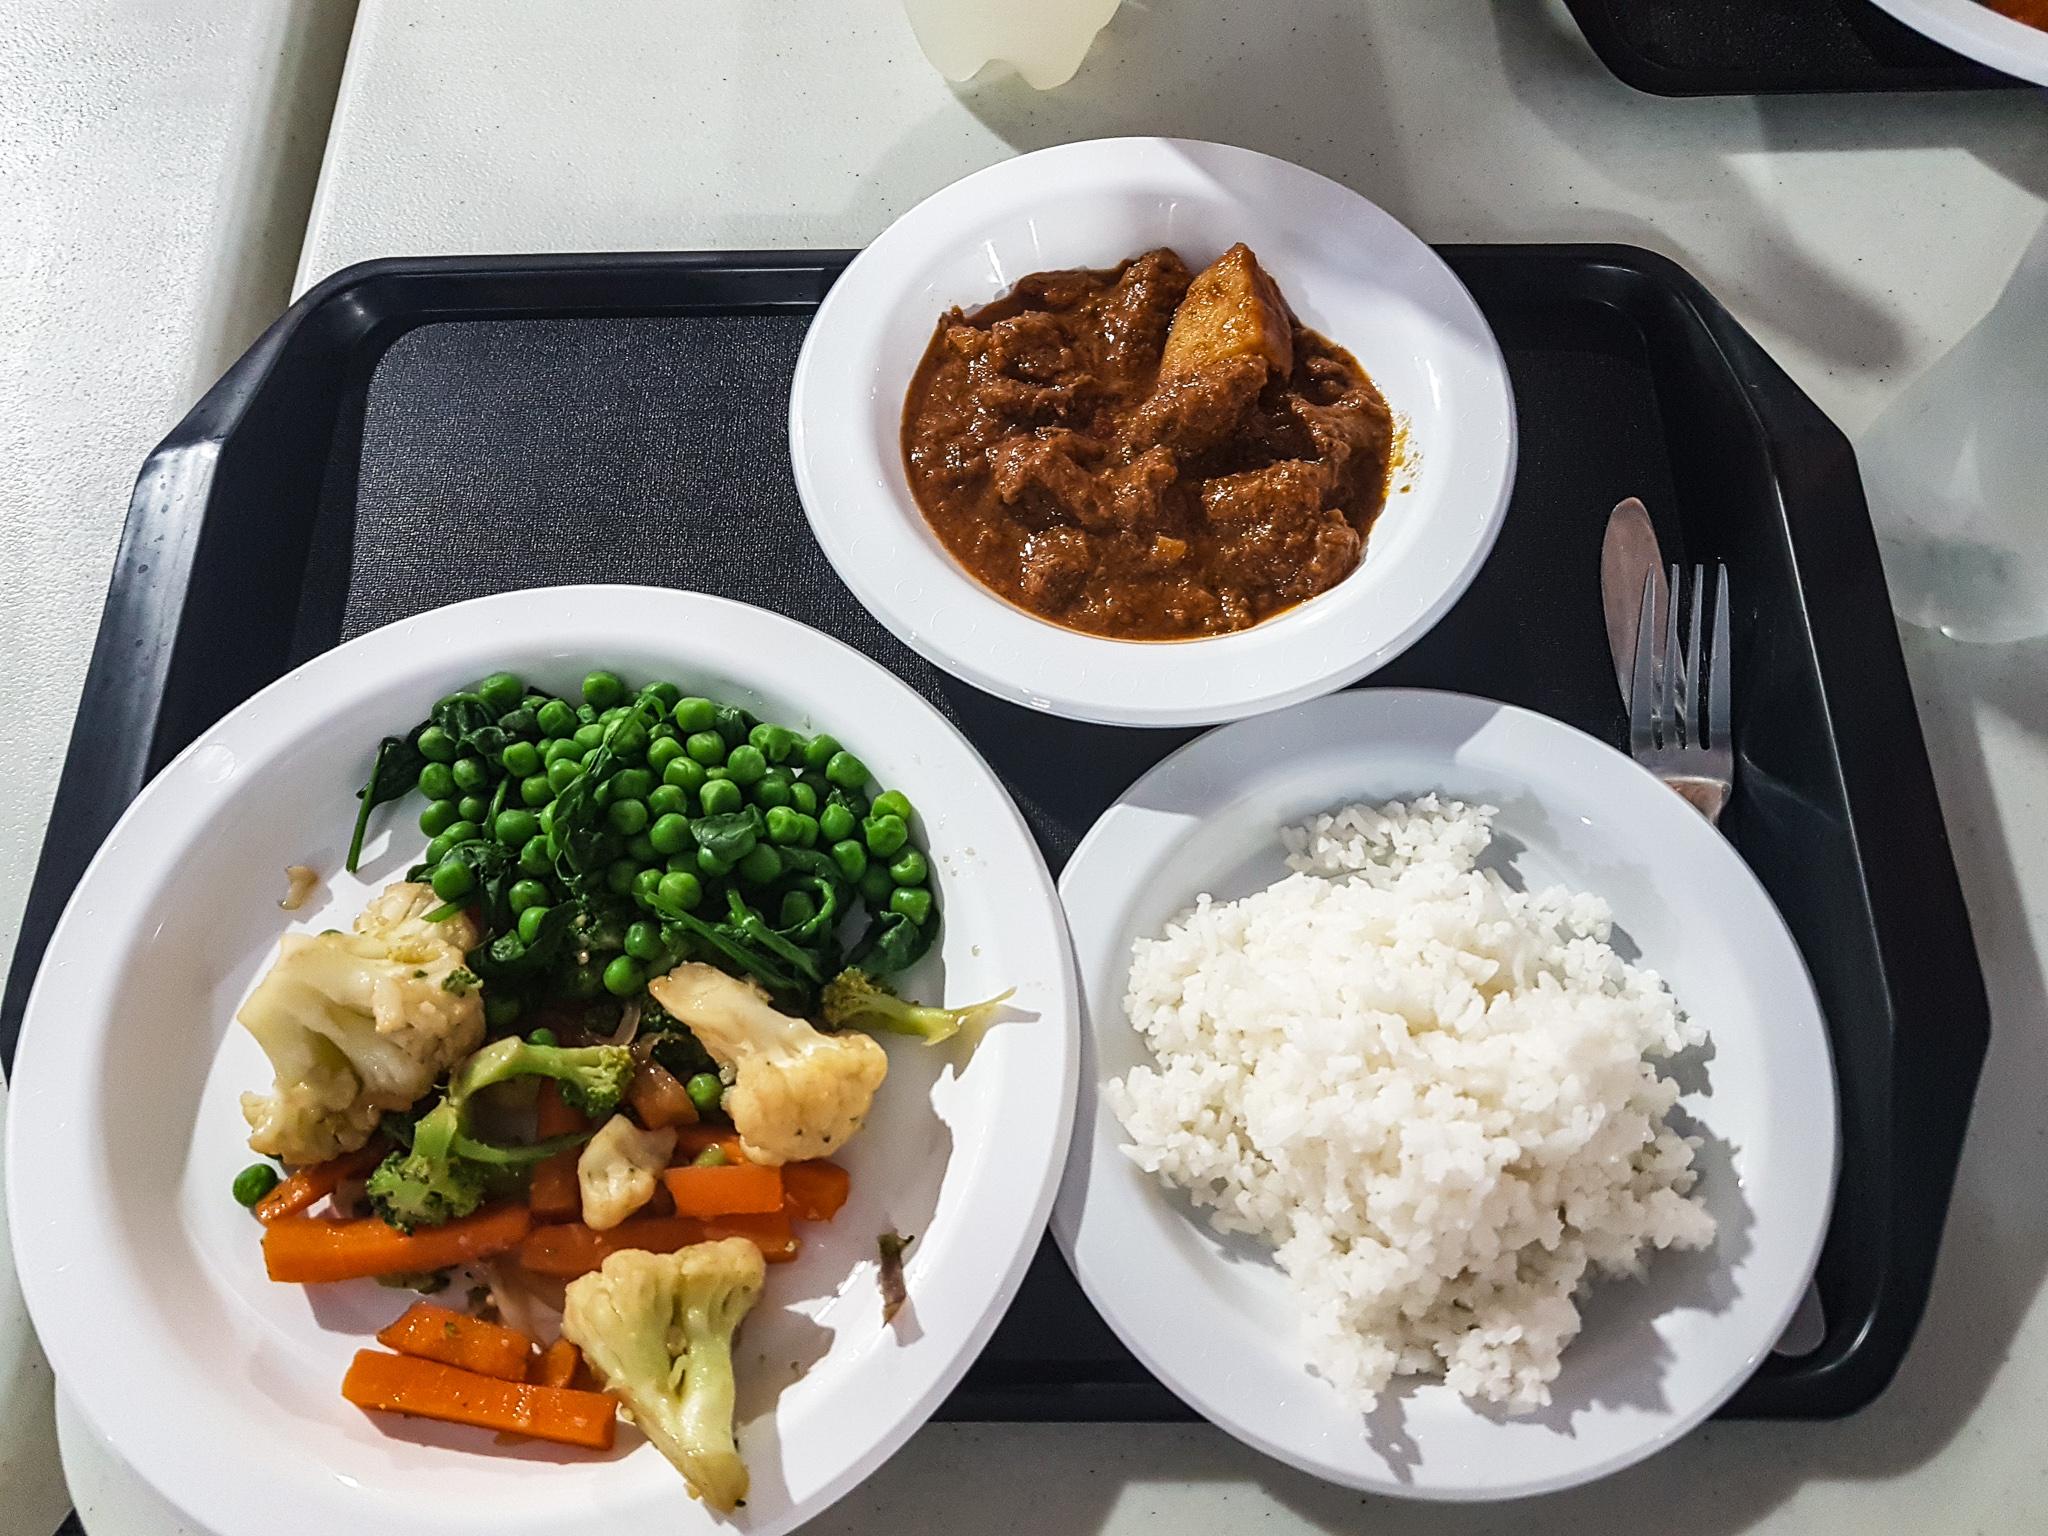 Commonwealth 2018 dining hall food